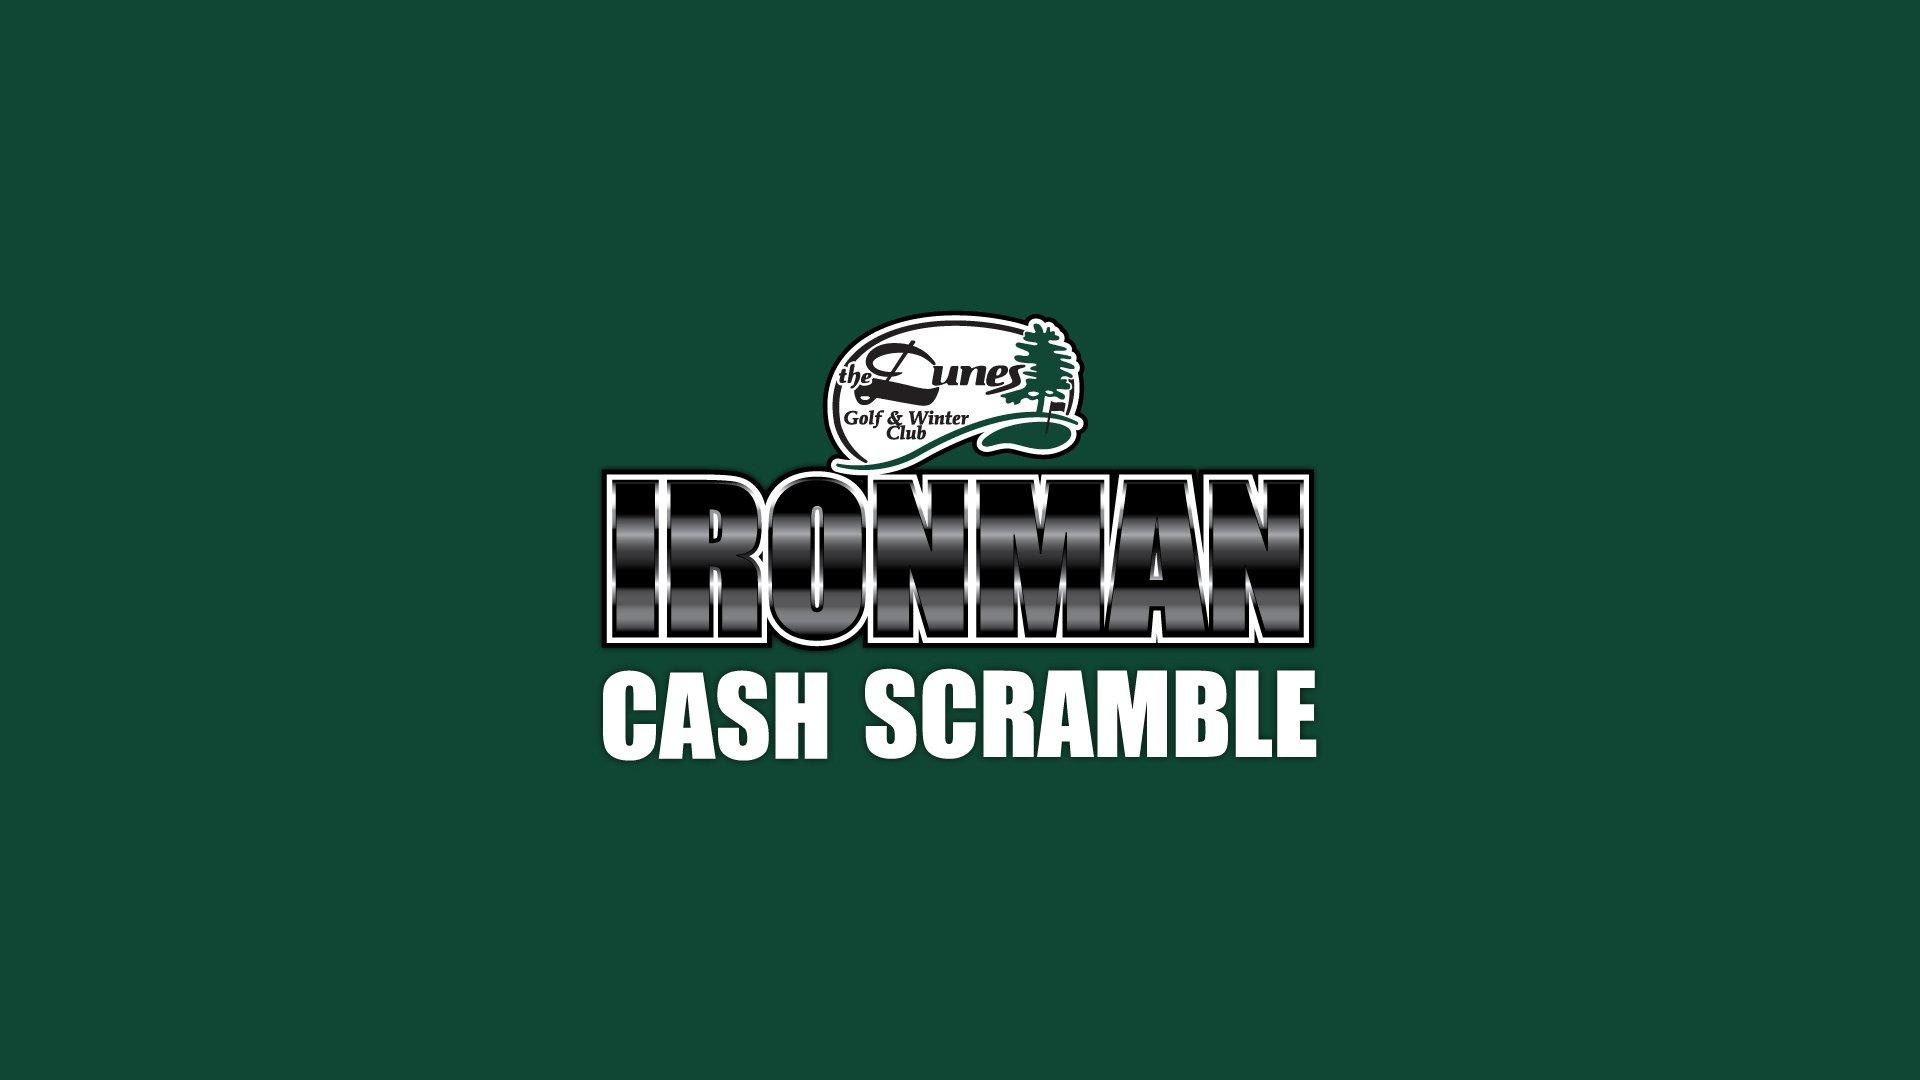 Ironman Cash Scramble